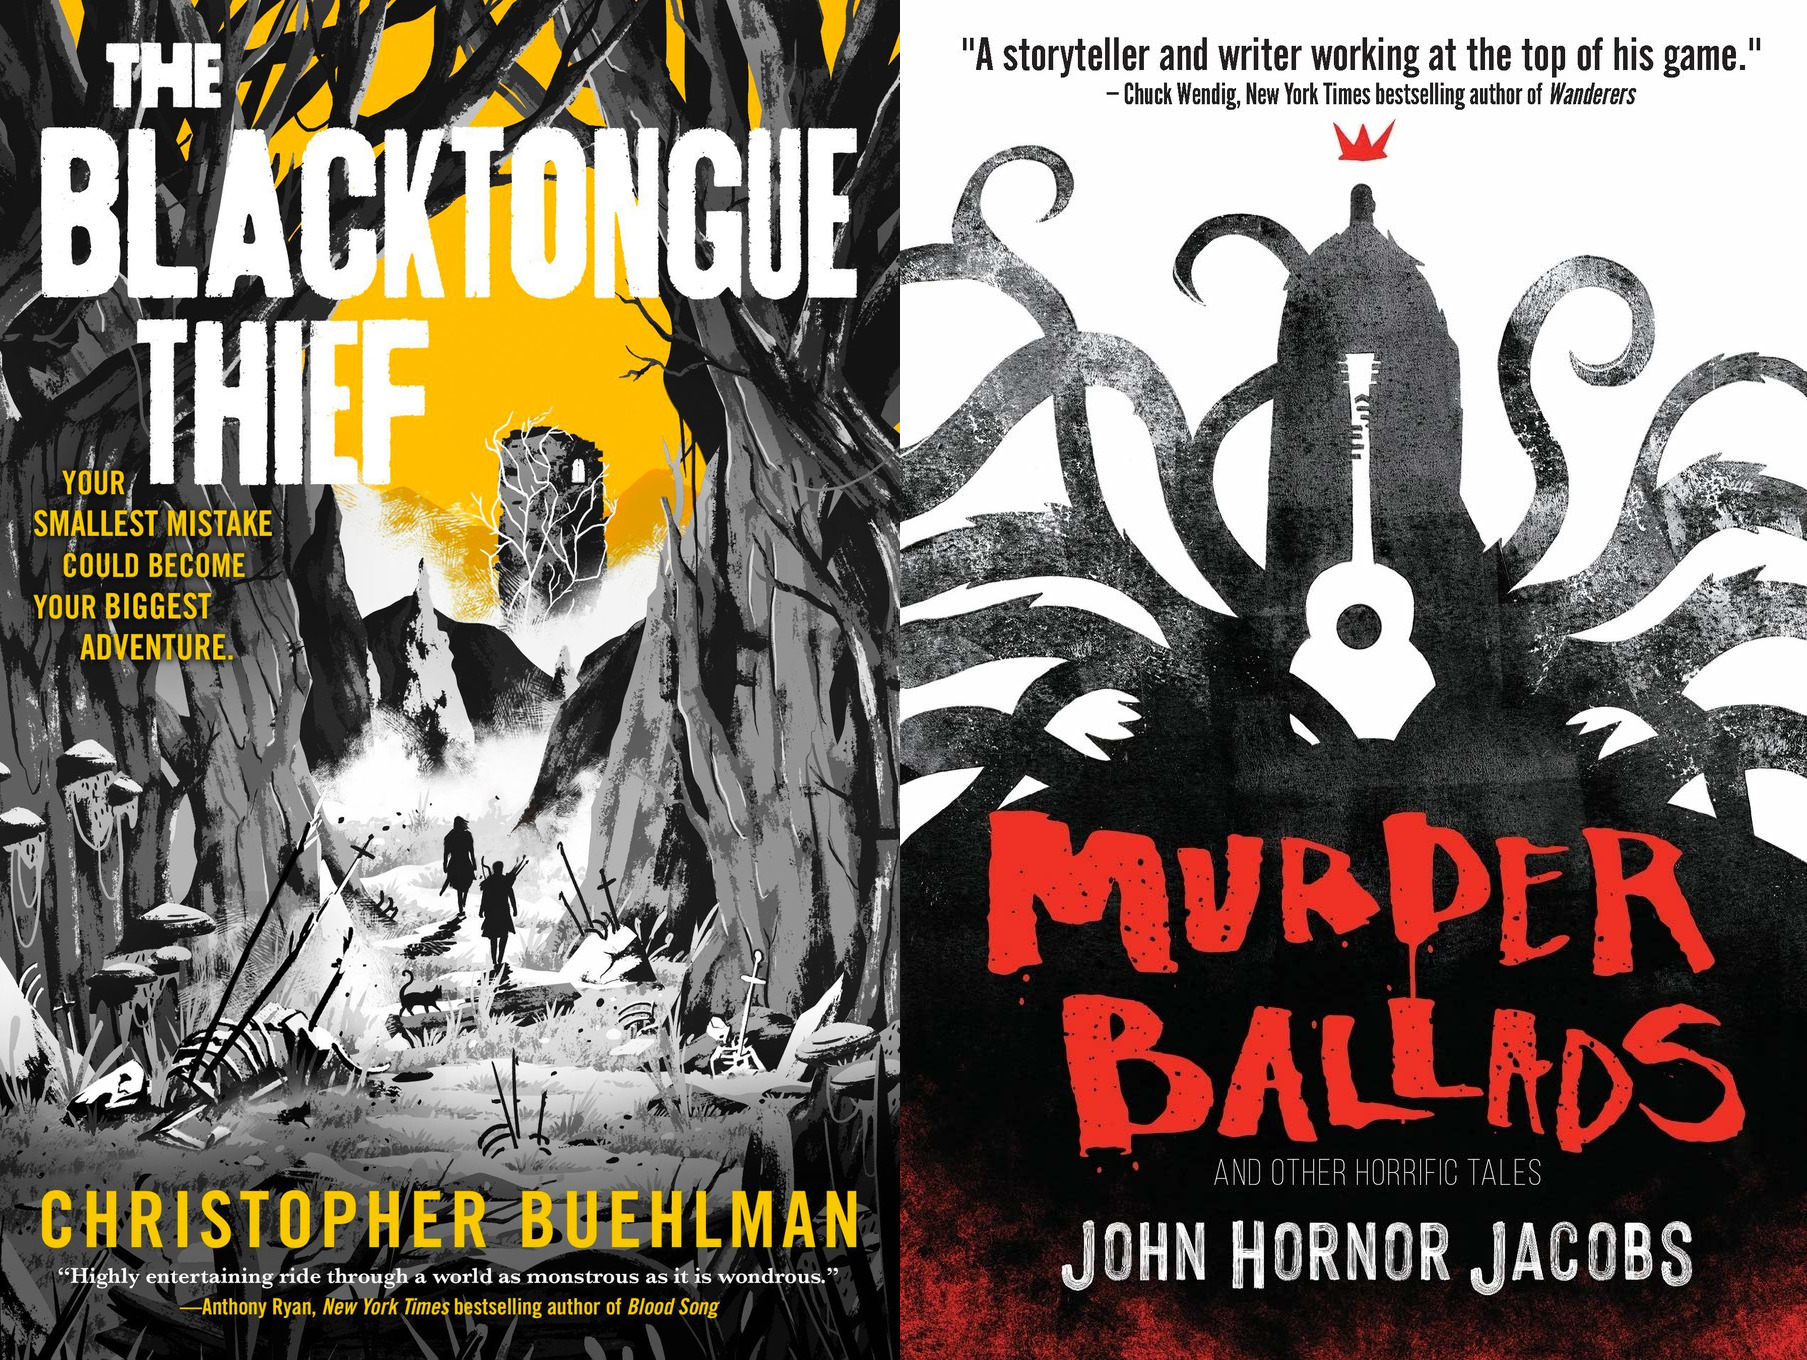 Christopher Buehlman interviews John Hornor Jacobs